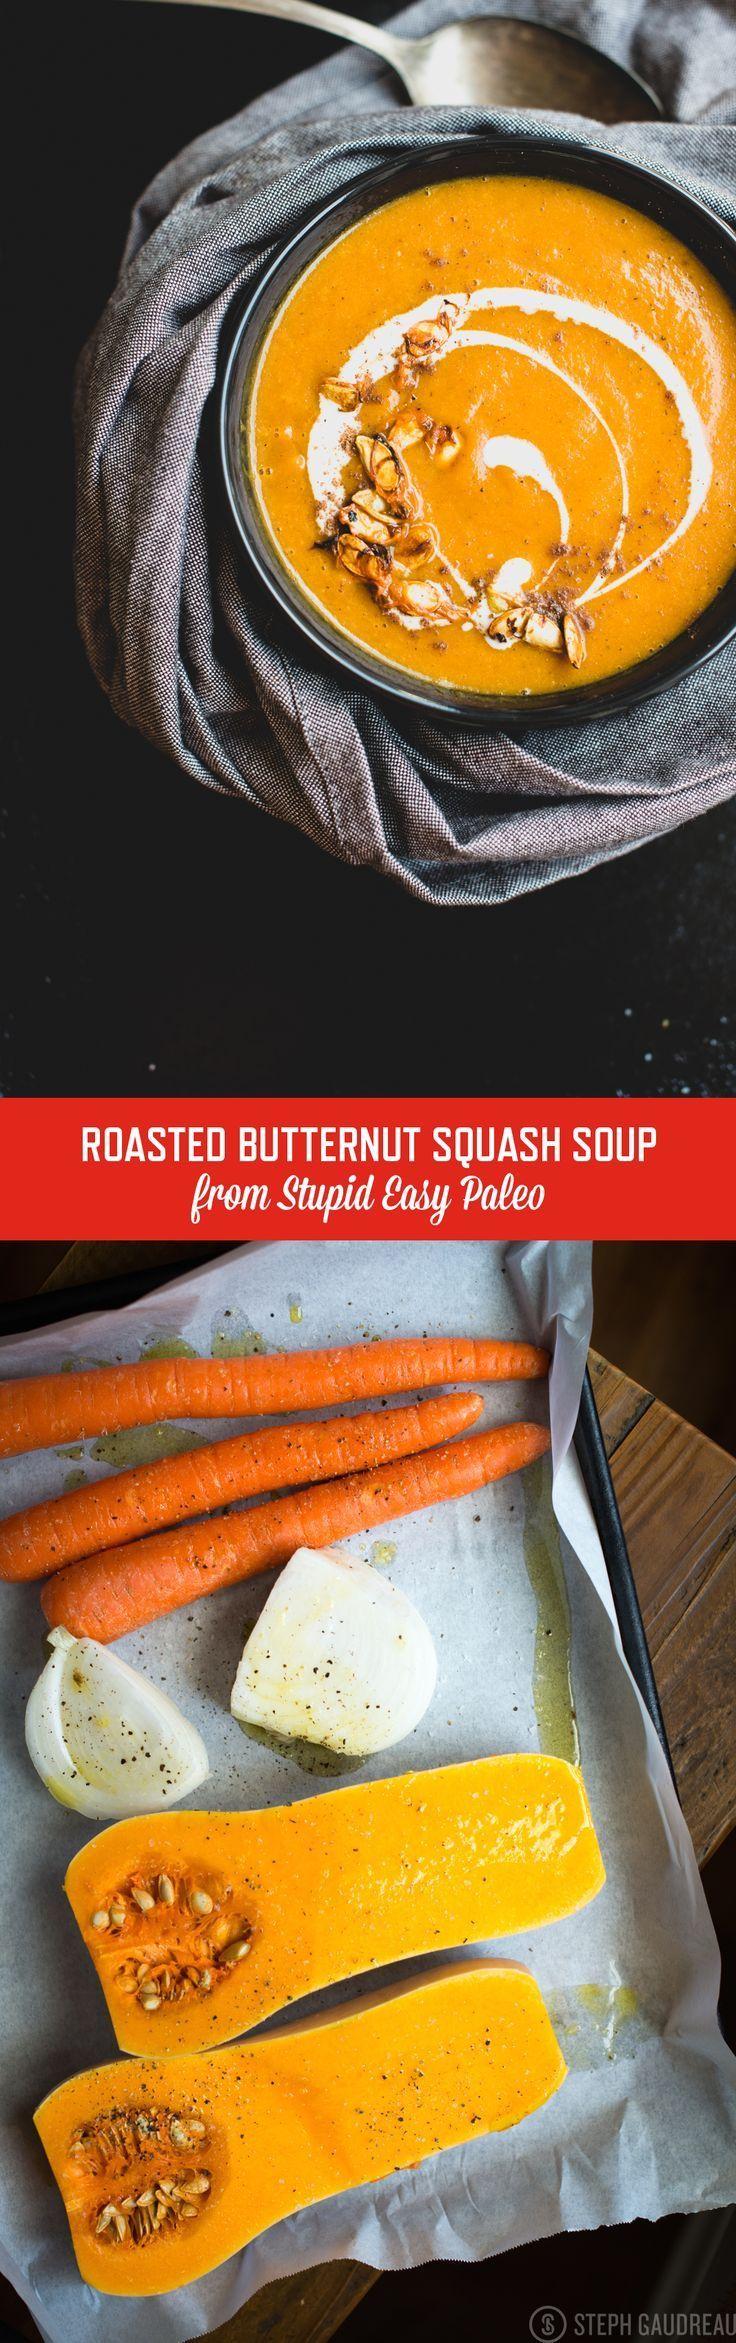 Roasted Butternut Squash Soup   http://StupidEasyPaleo.com